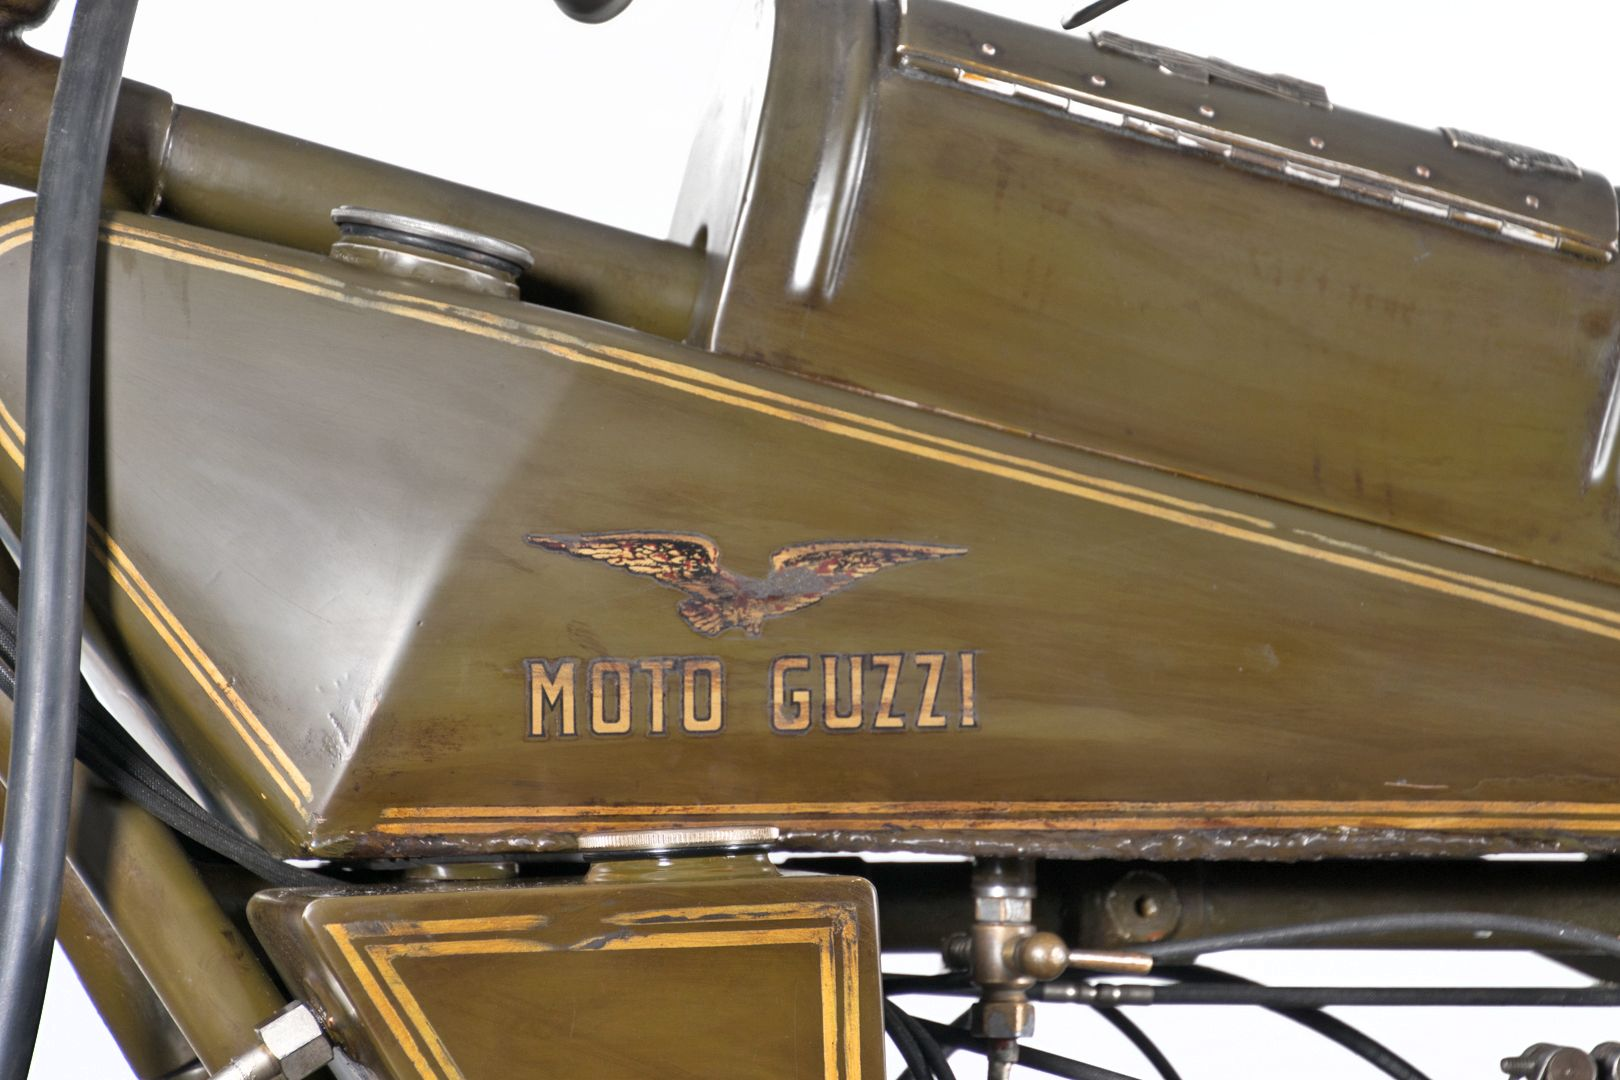 1924 Moto Guzzi 500 Normale 36467